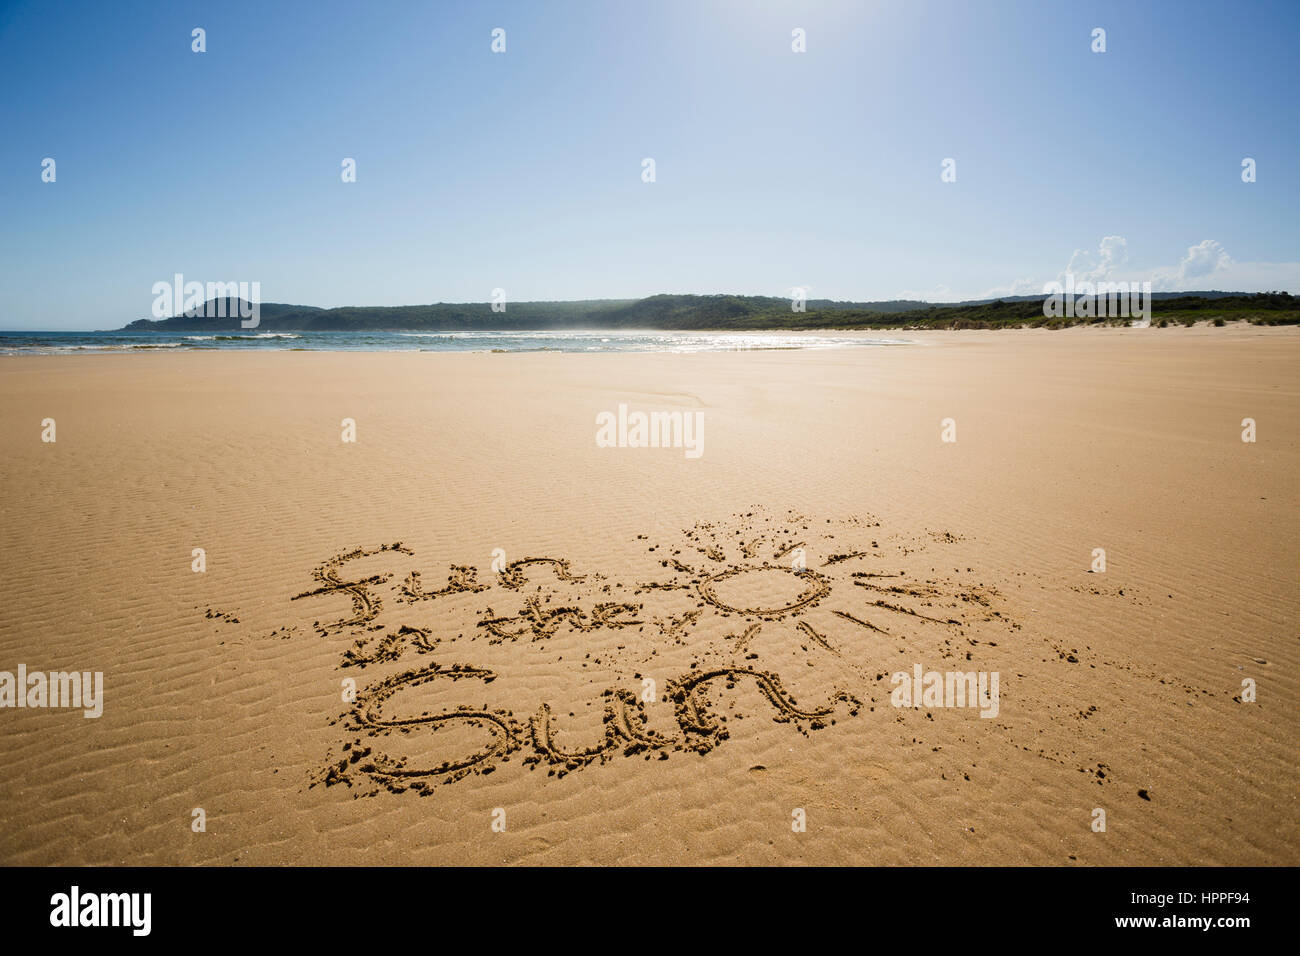 Fun in the sun written in sand at the beach, Croajingolong, Victoria, Australia - Stock Image